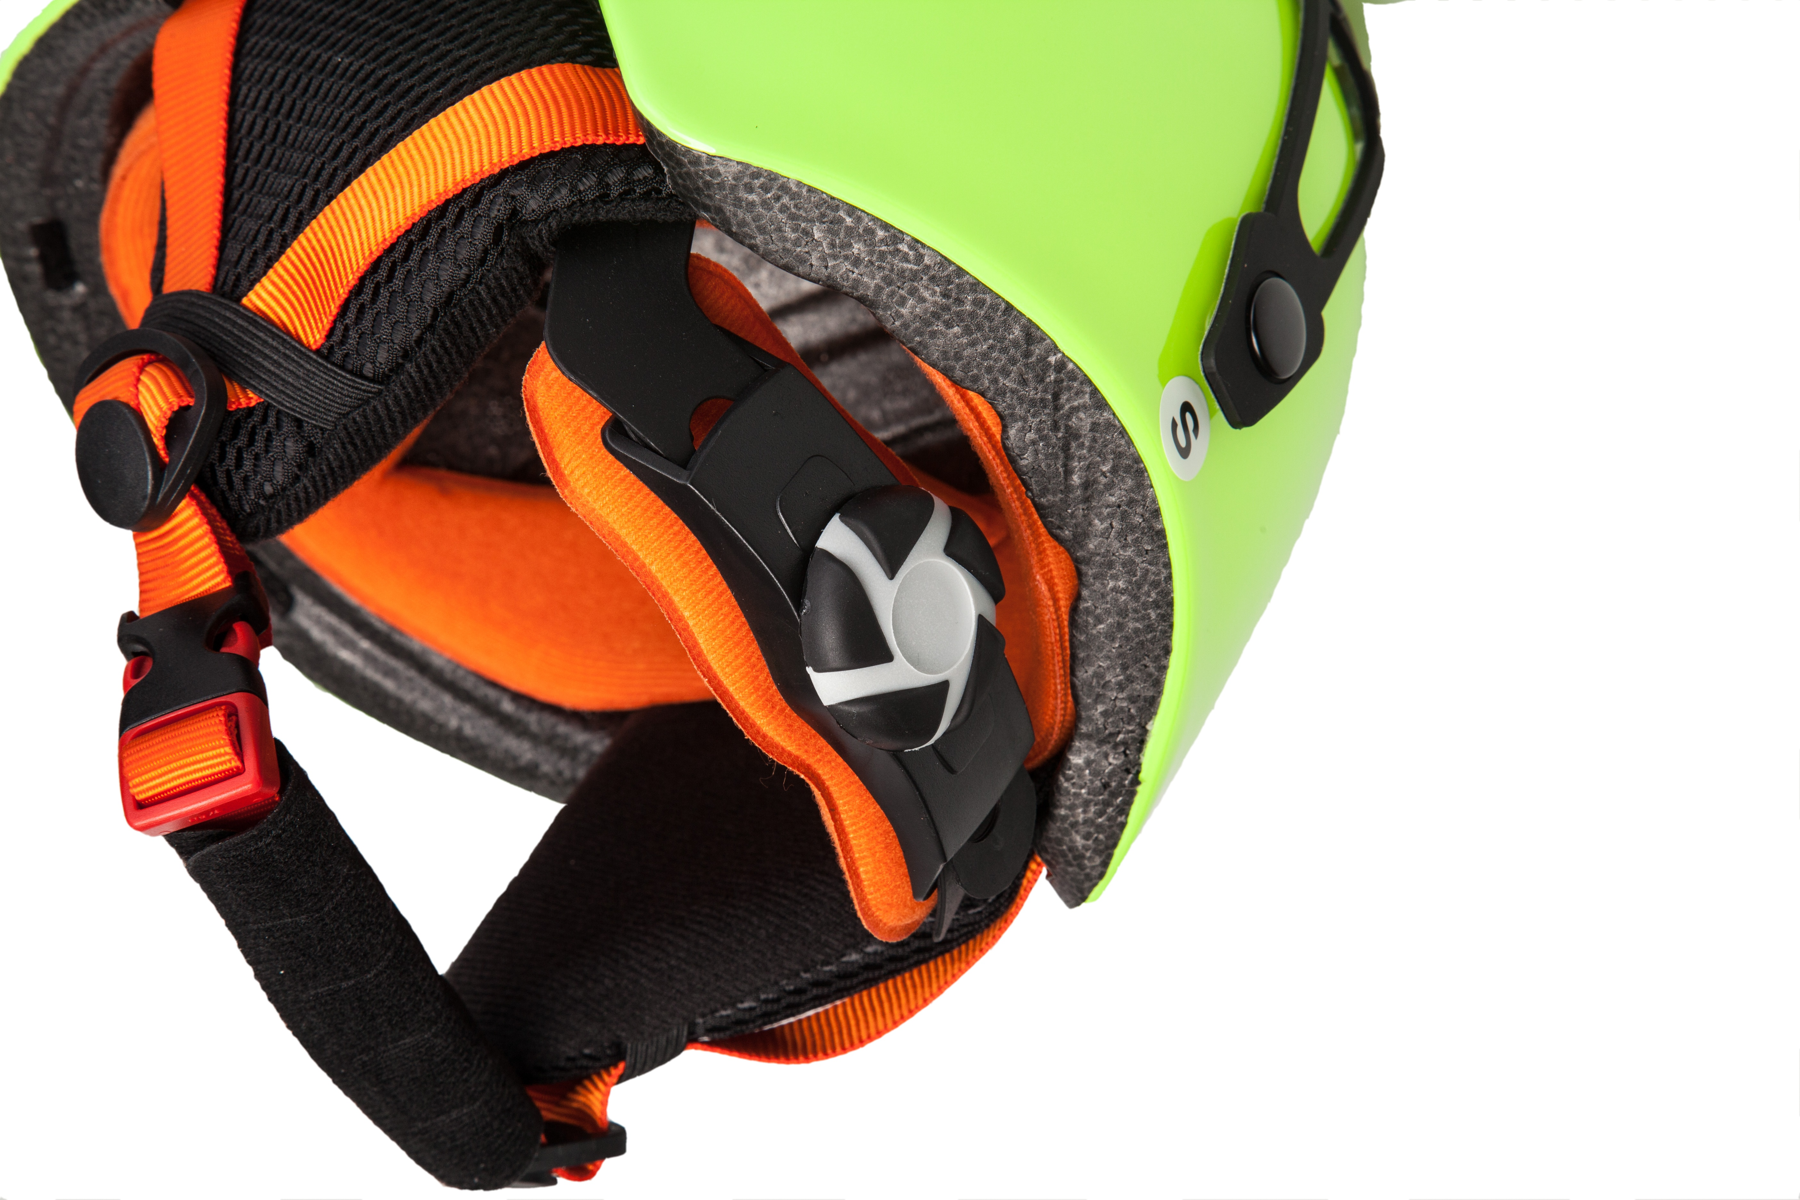 SIGNAL ski helmet, yellow